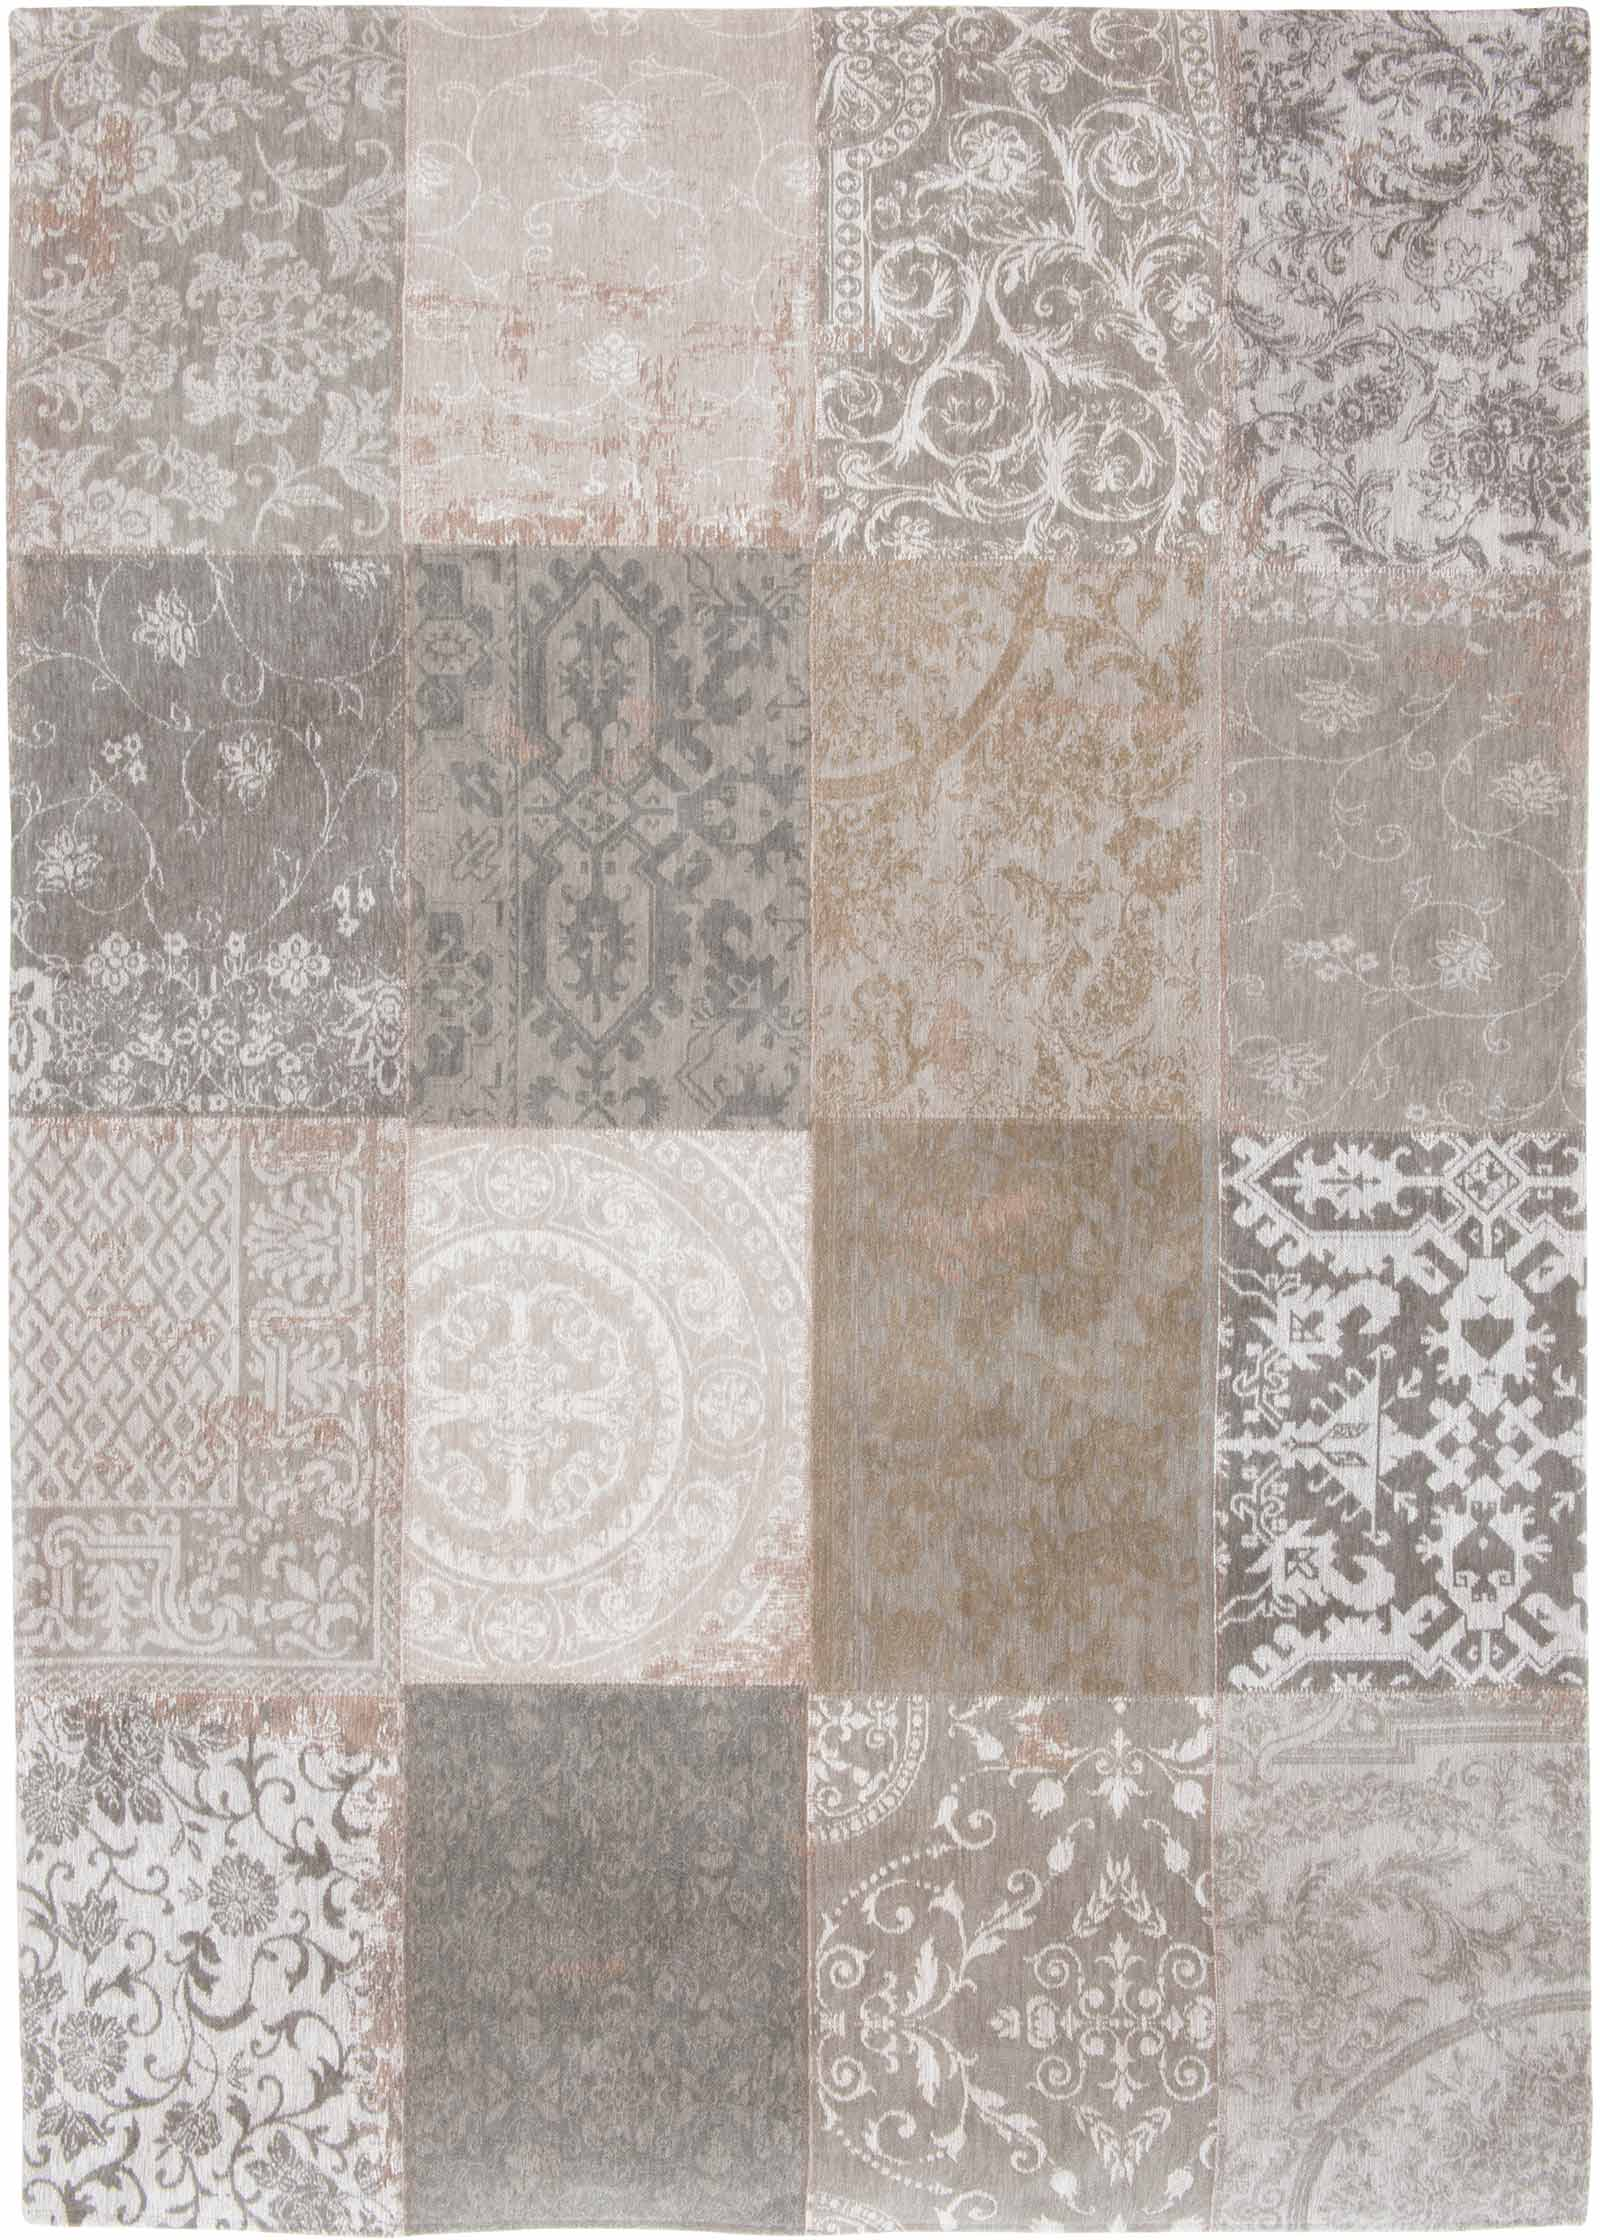 louis de poortere tapis vintage ghent beige 8982 patchwork multi design tapisdeluxe fr